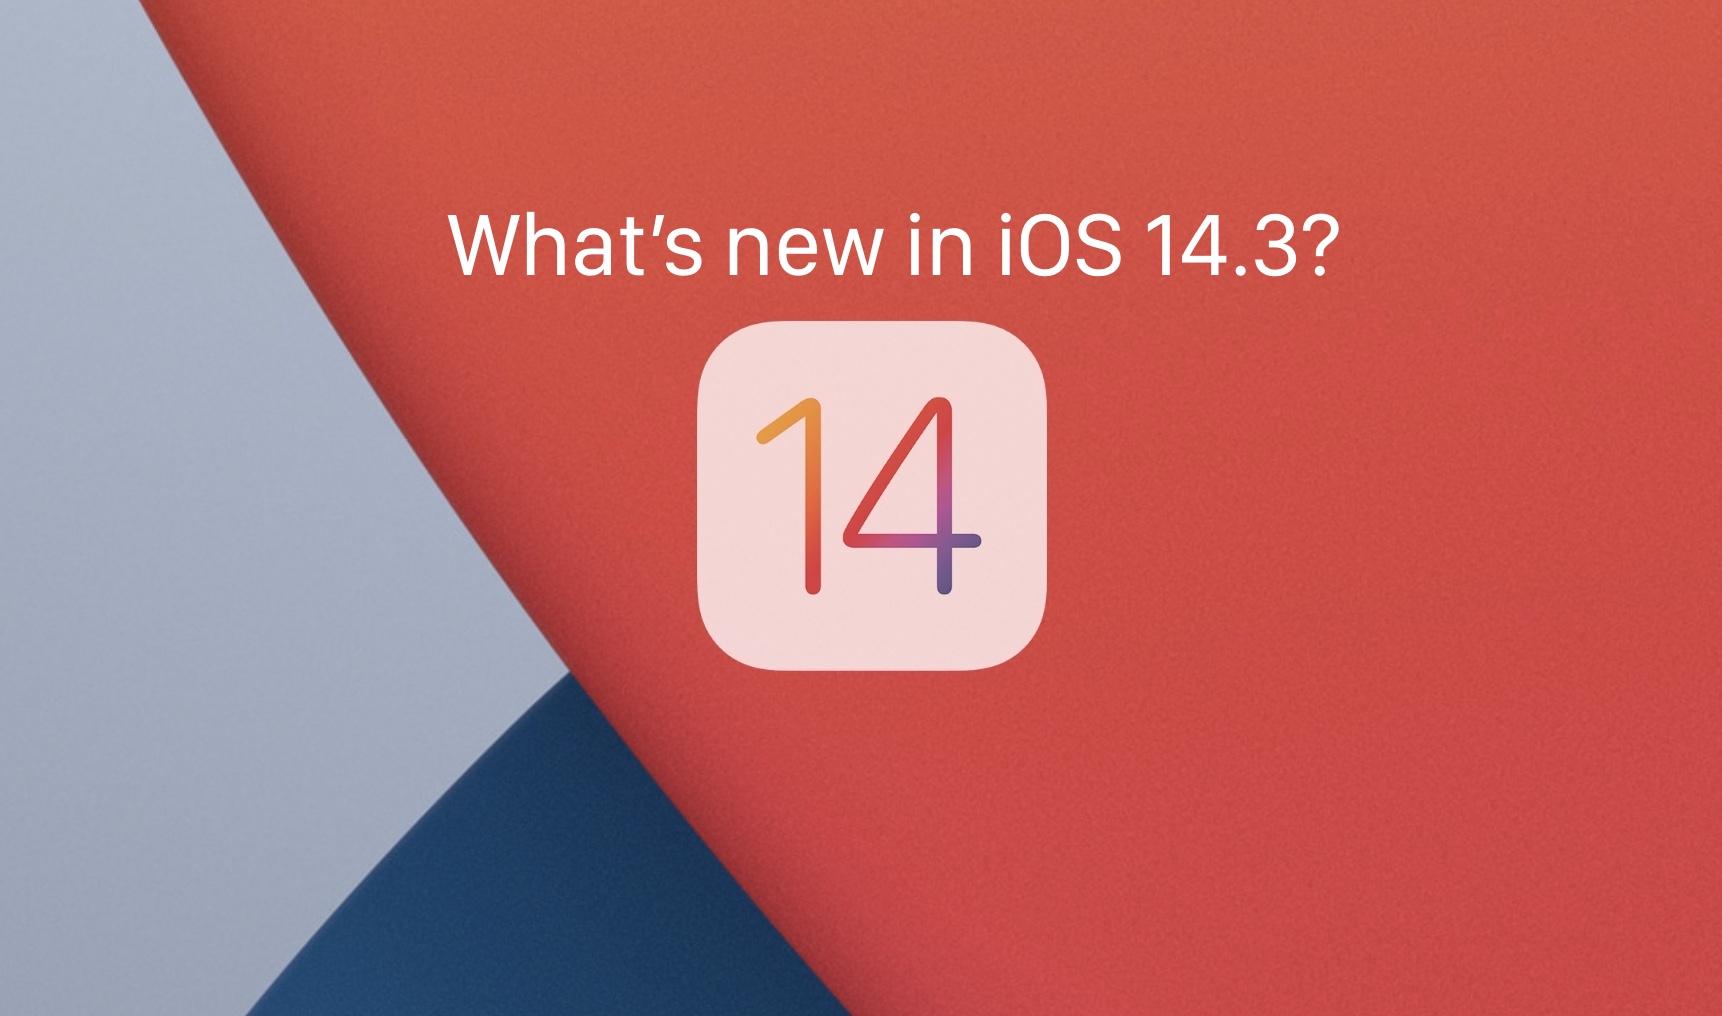 iOS 14.3 features